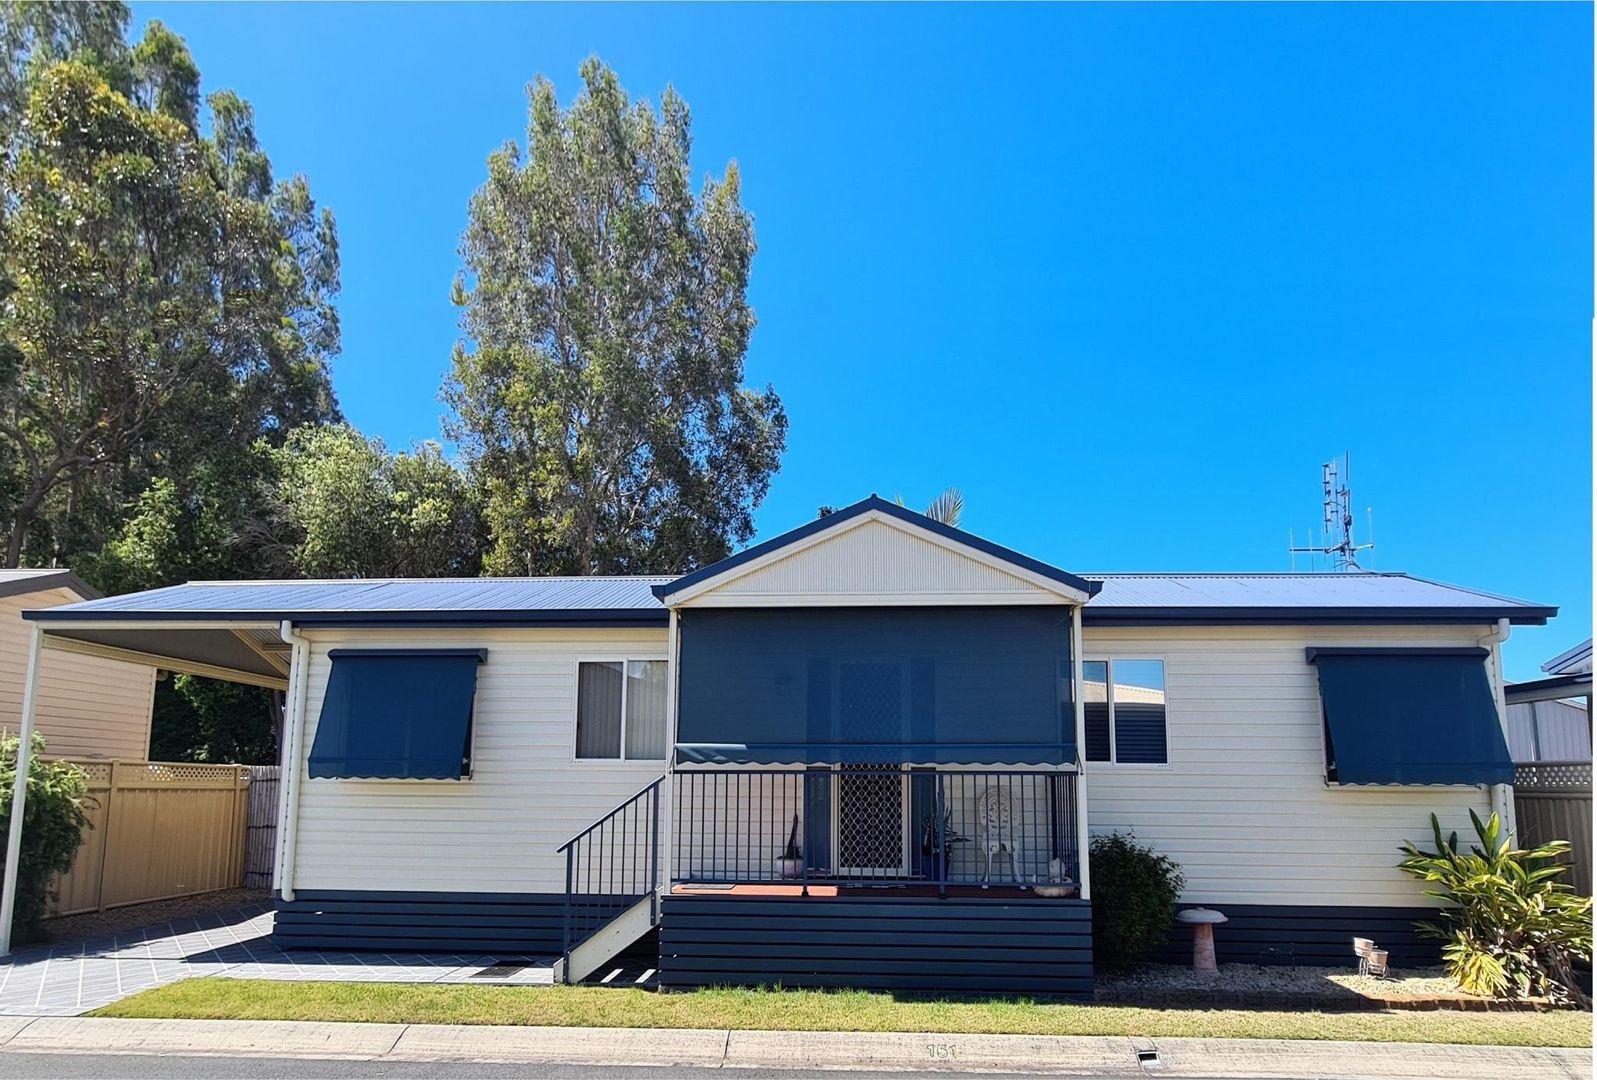 151/133 South Street, Tuncurry NSW 2428, Image 0